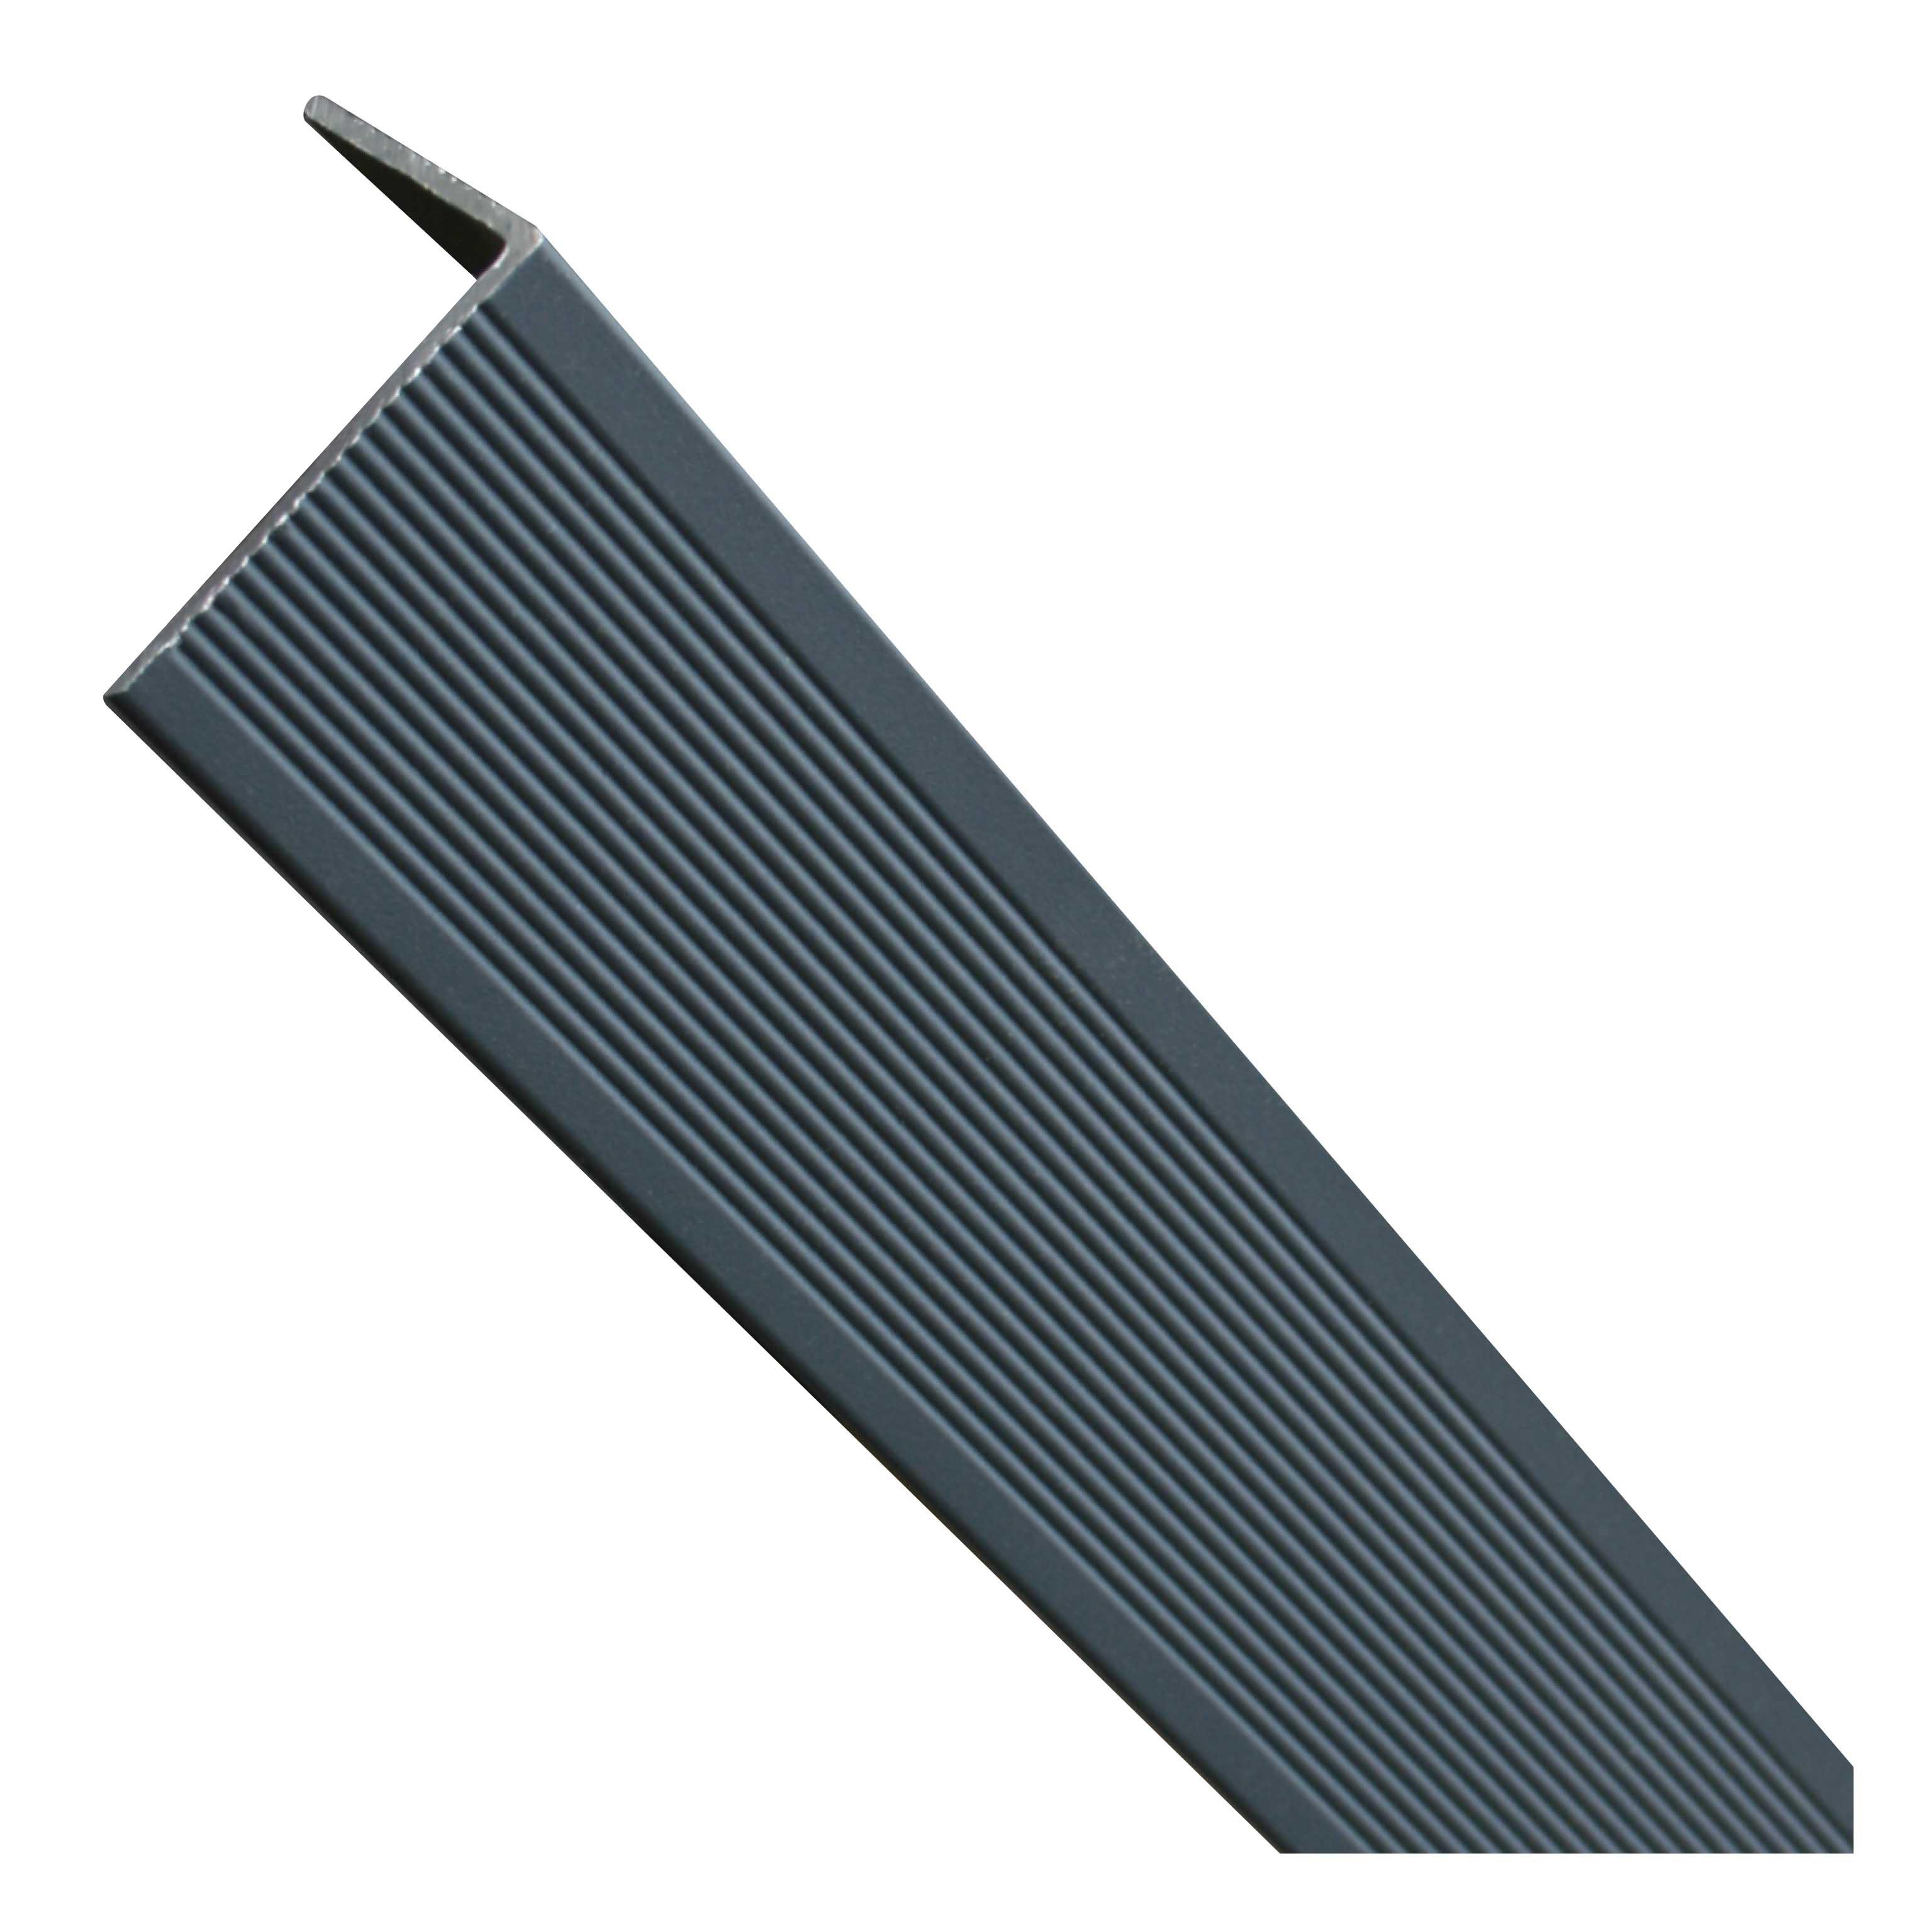 Abschlussprofil Aluminium Anthrazit 45 x 35 x 3000 mm